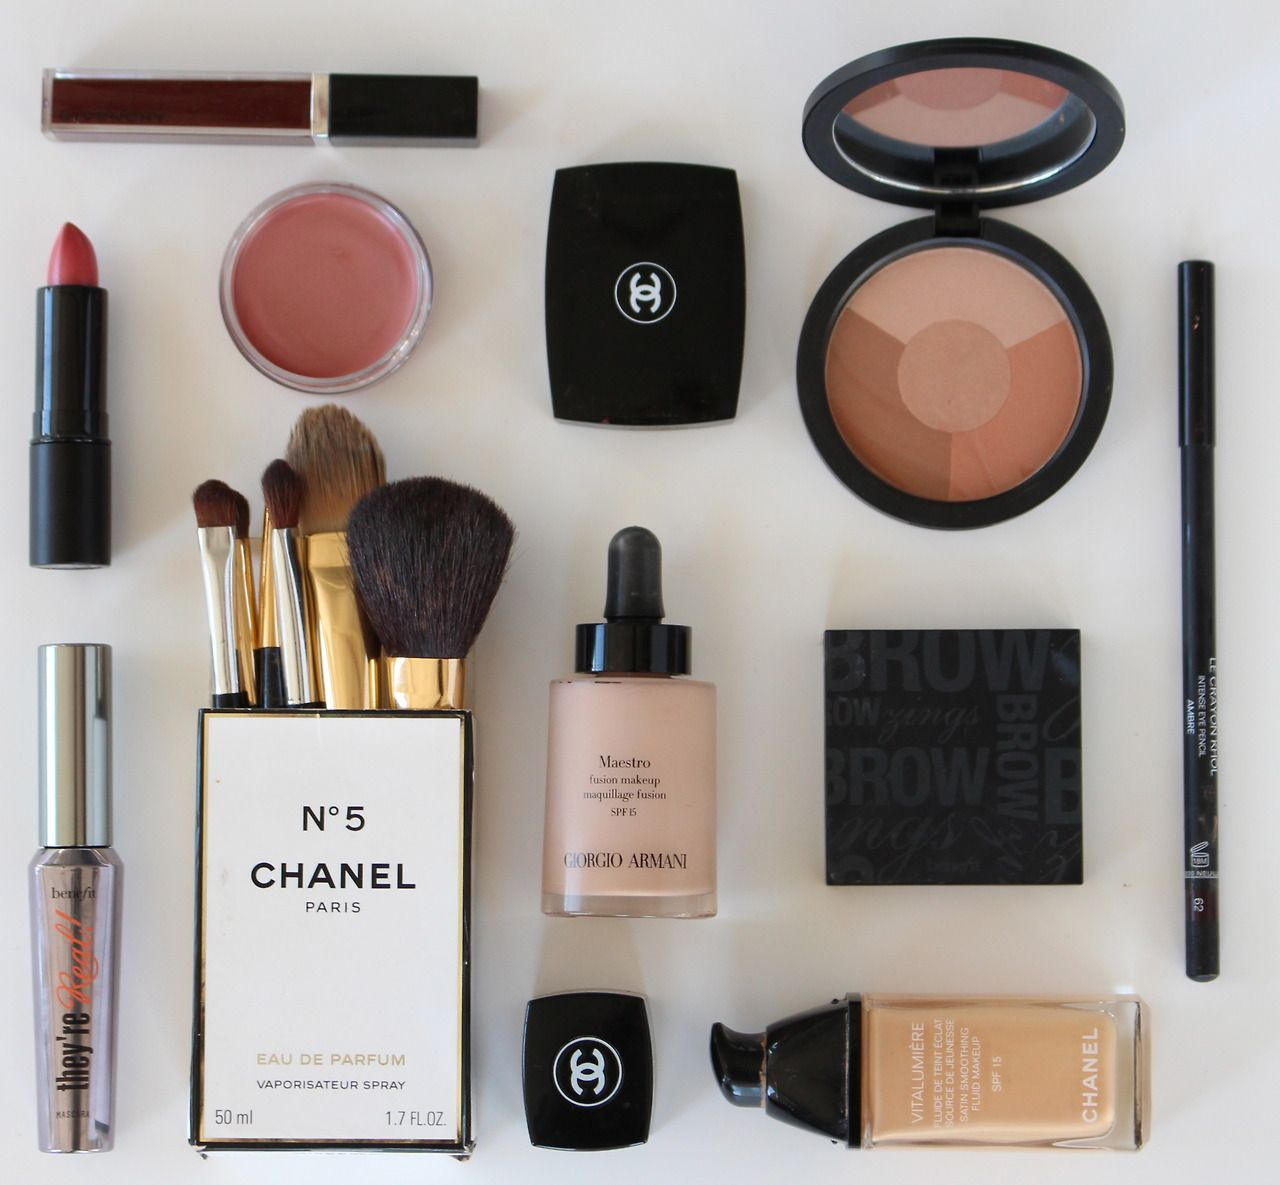 #Makeup #Chanel